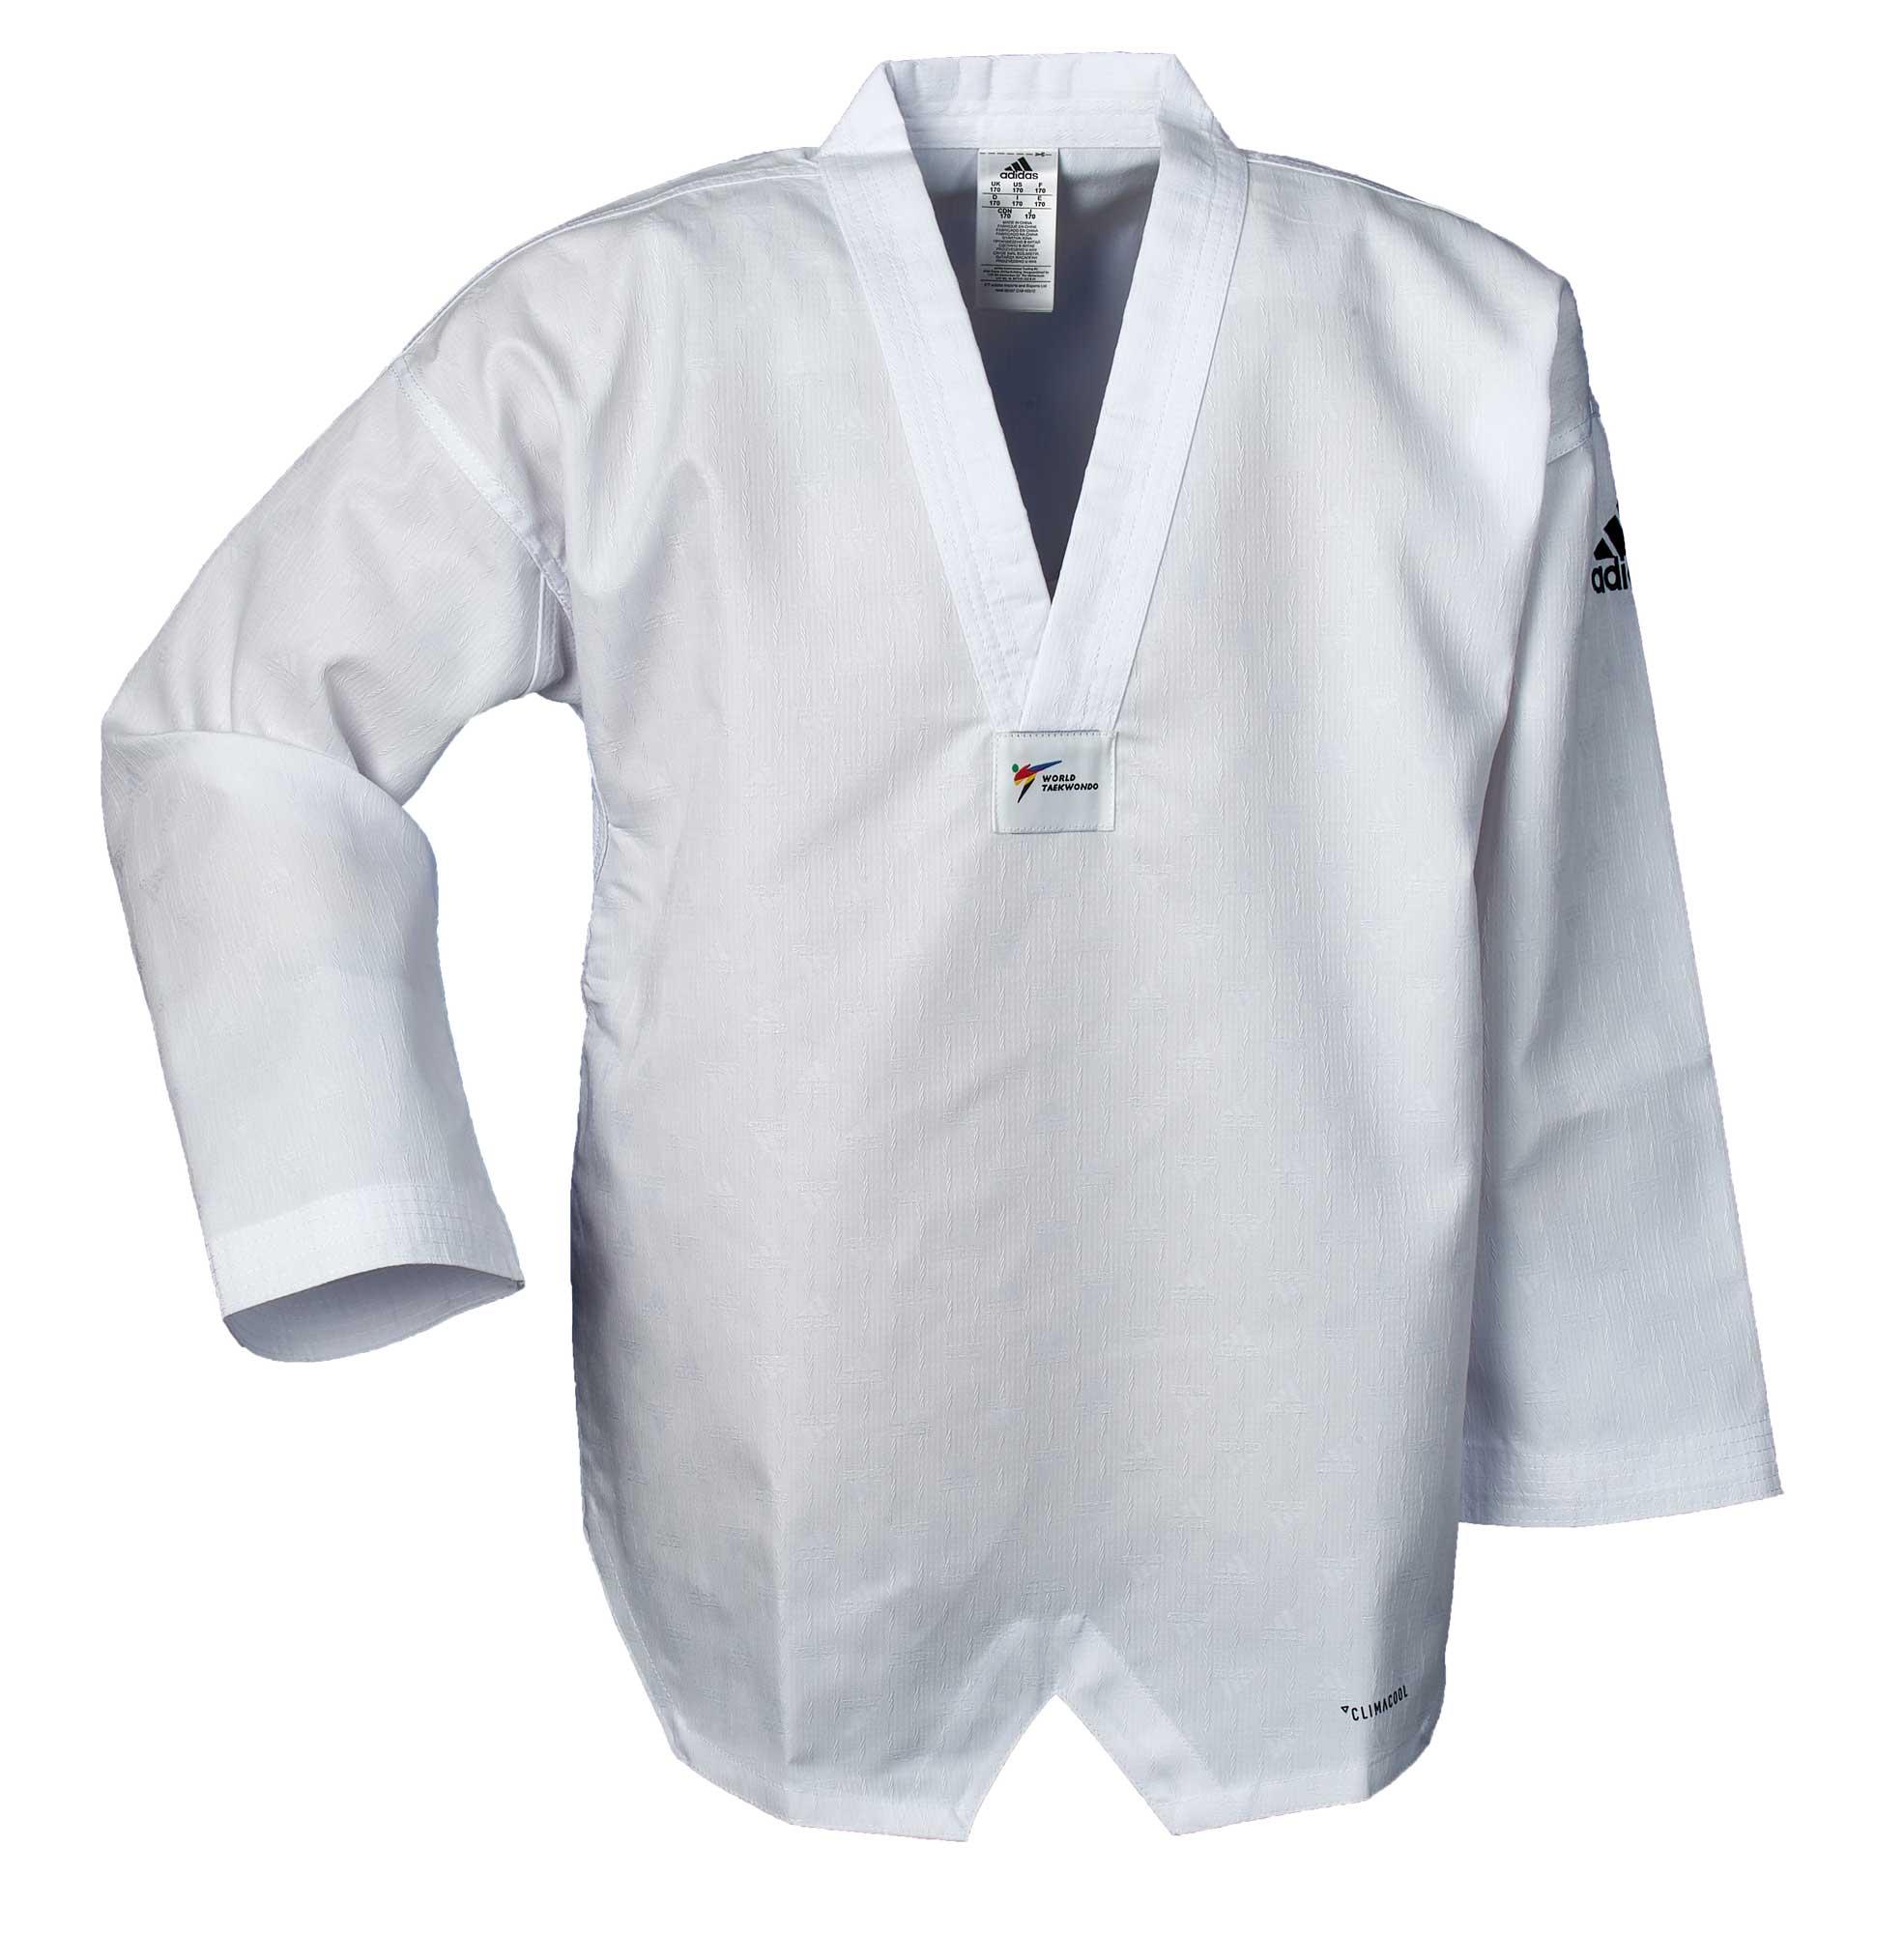 adidas Taekwondo Anzug adiChamp IV, weißes Revers, ADITCH04